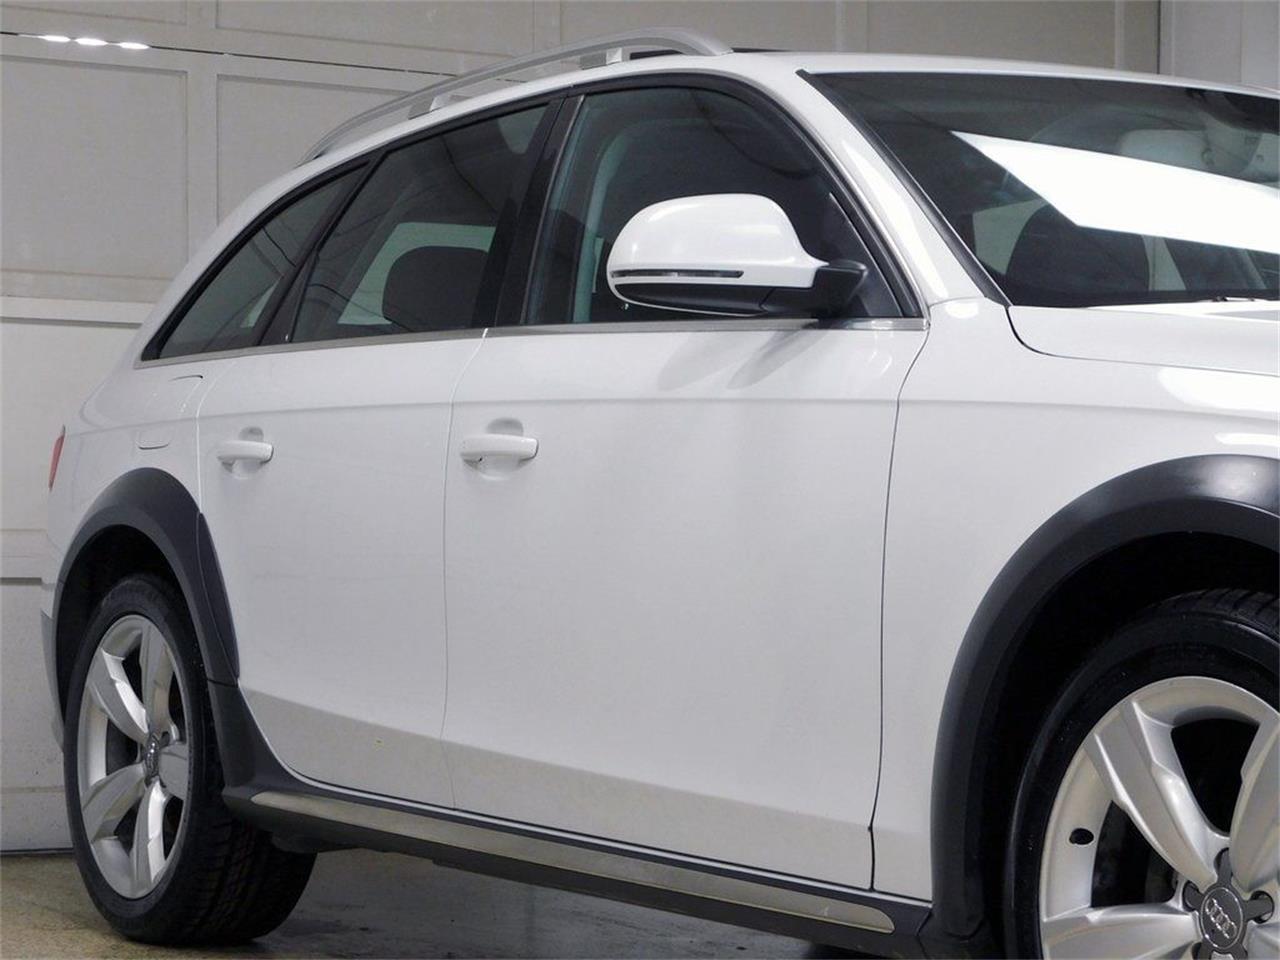 2013 Audi A4 (CC-1419287) for sale in Hamburg, New York